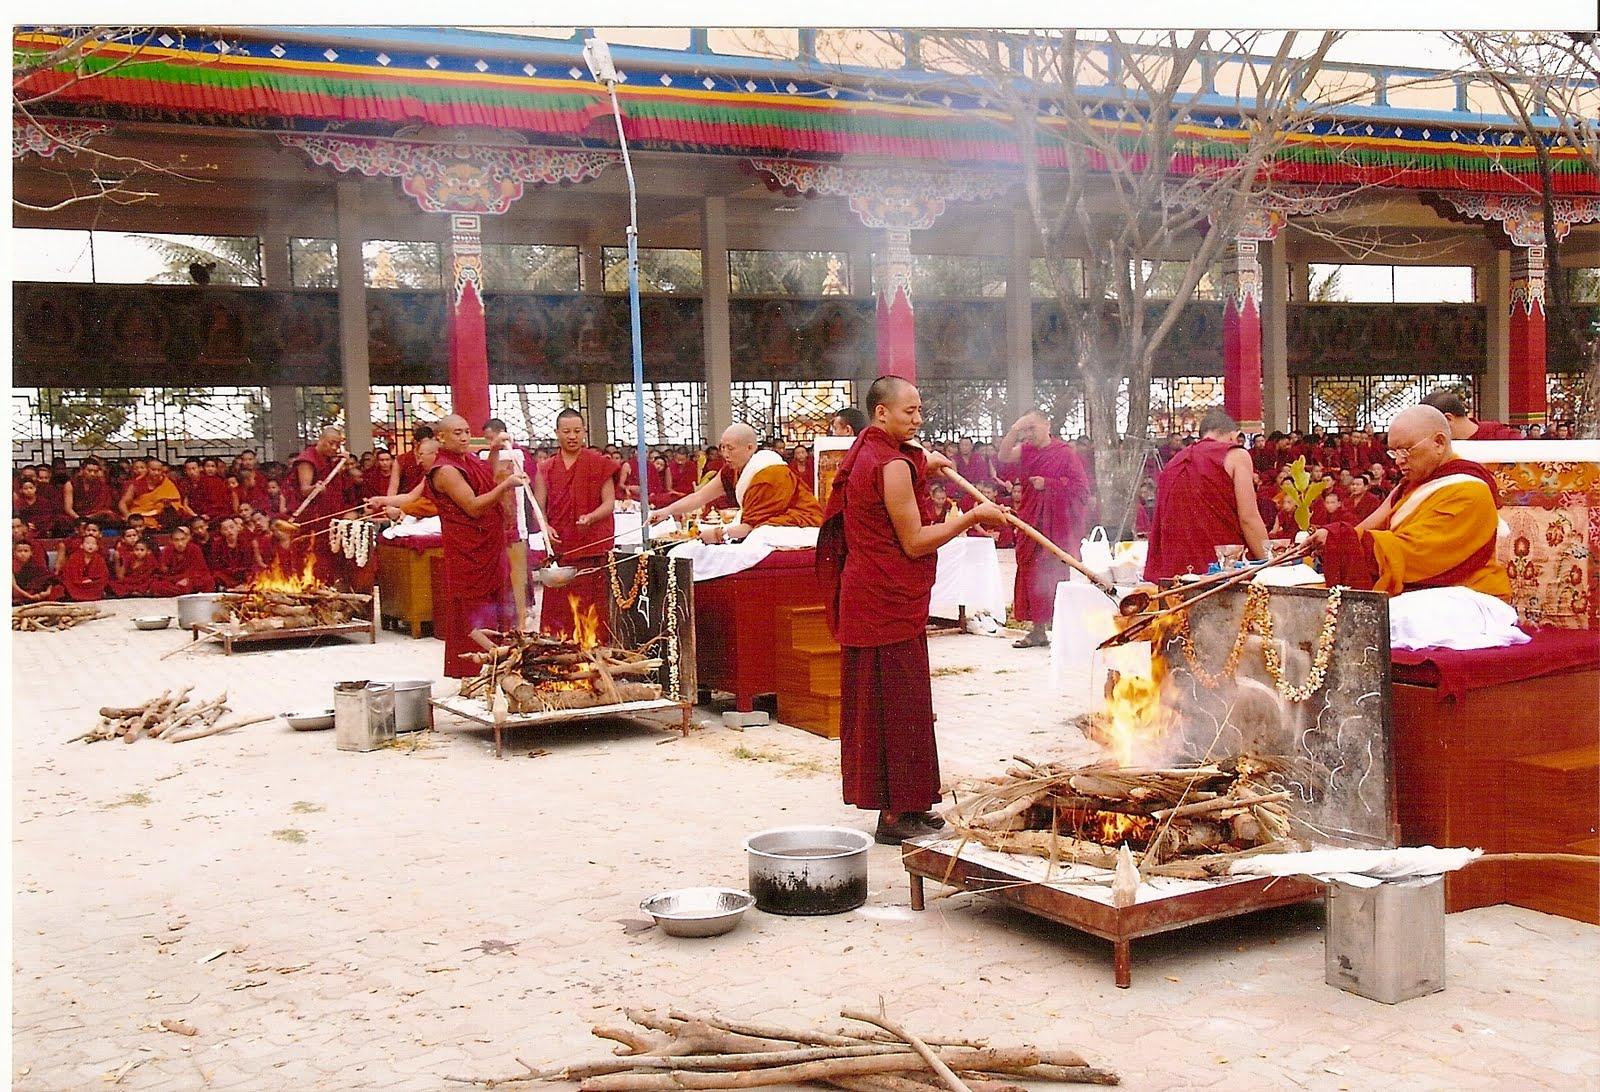 Lama Zopa Rinpoche and high Lamas doing fire pujas at Sera Je Monastery